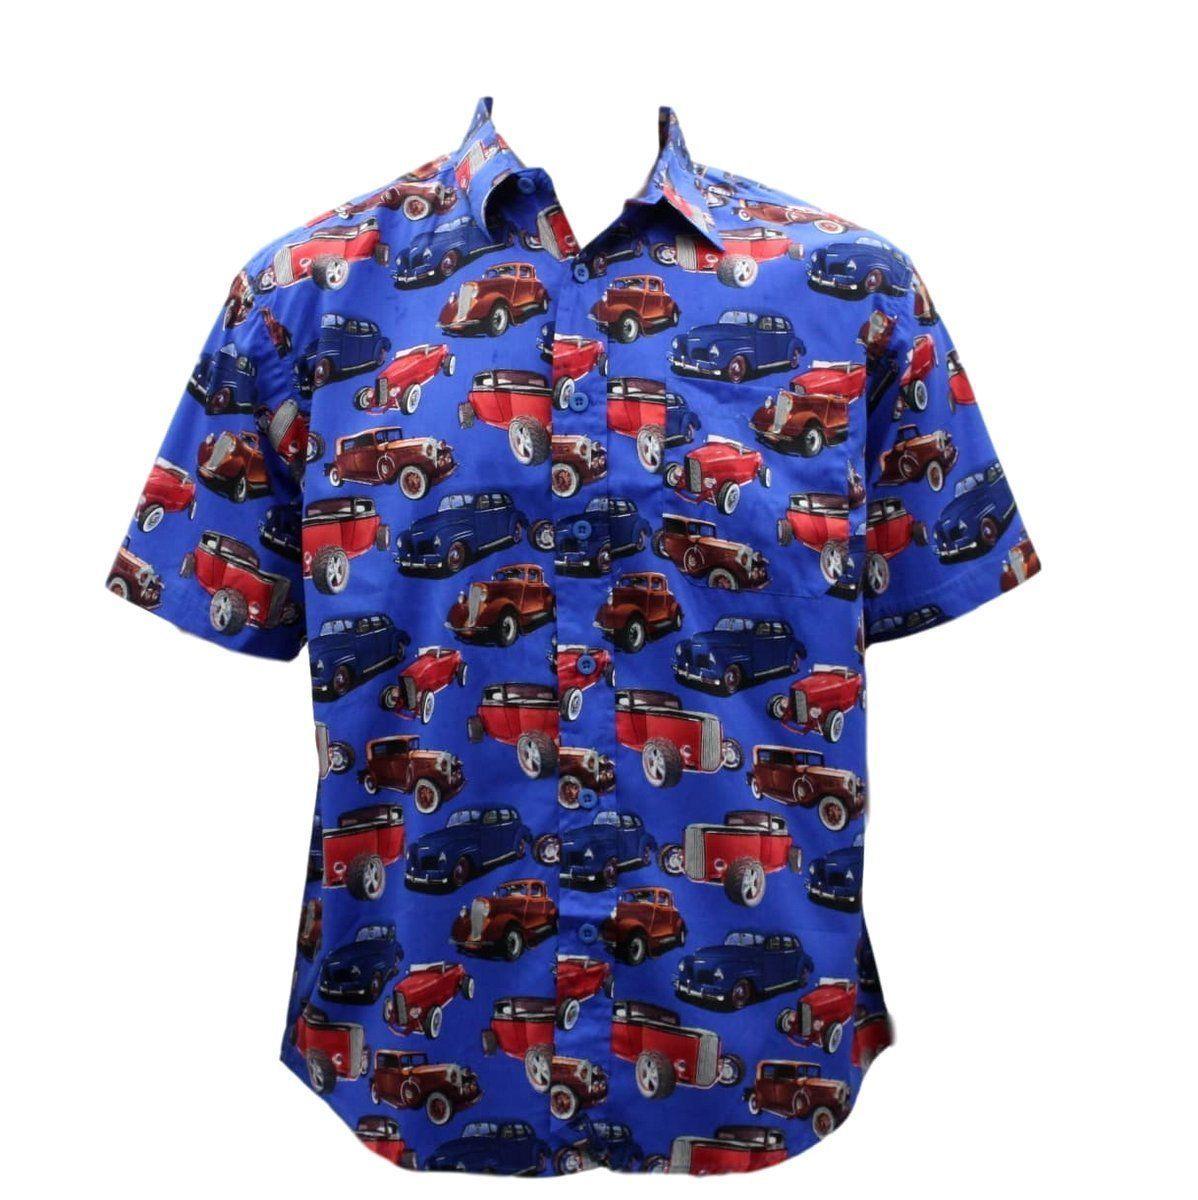 thumbnail 84 - NEW Men's Short Sleeve 100% Cotton Shirt Tropical Hawaiian Summer Style S-6XL